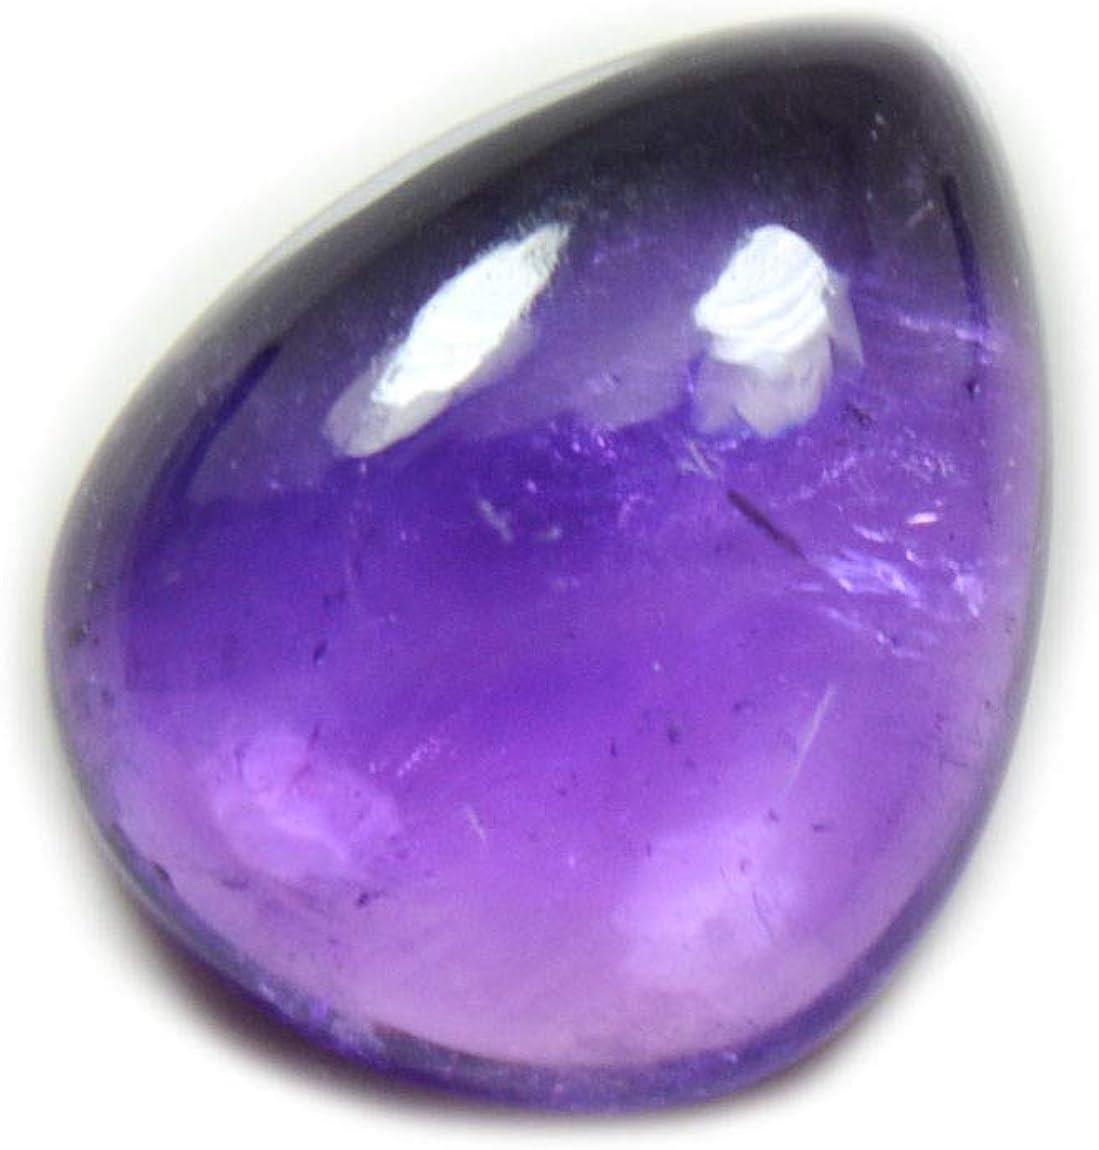 Natural Amethyst cabochon #1078A Nice Amethyst loose stone 62 Cts Amethyst loose gemstone Very Rare Gracious Purple Amethyst gemstone